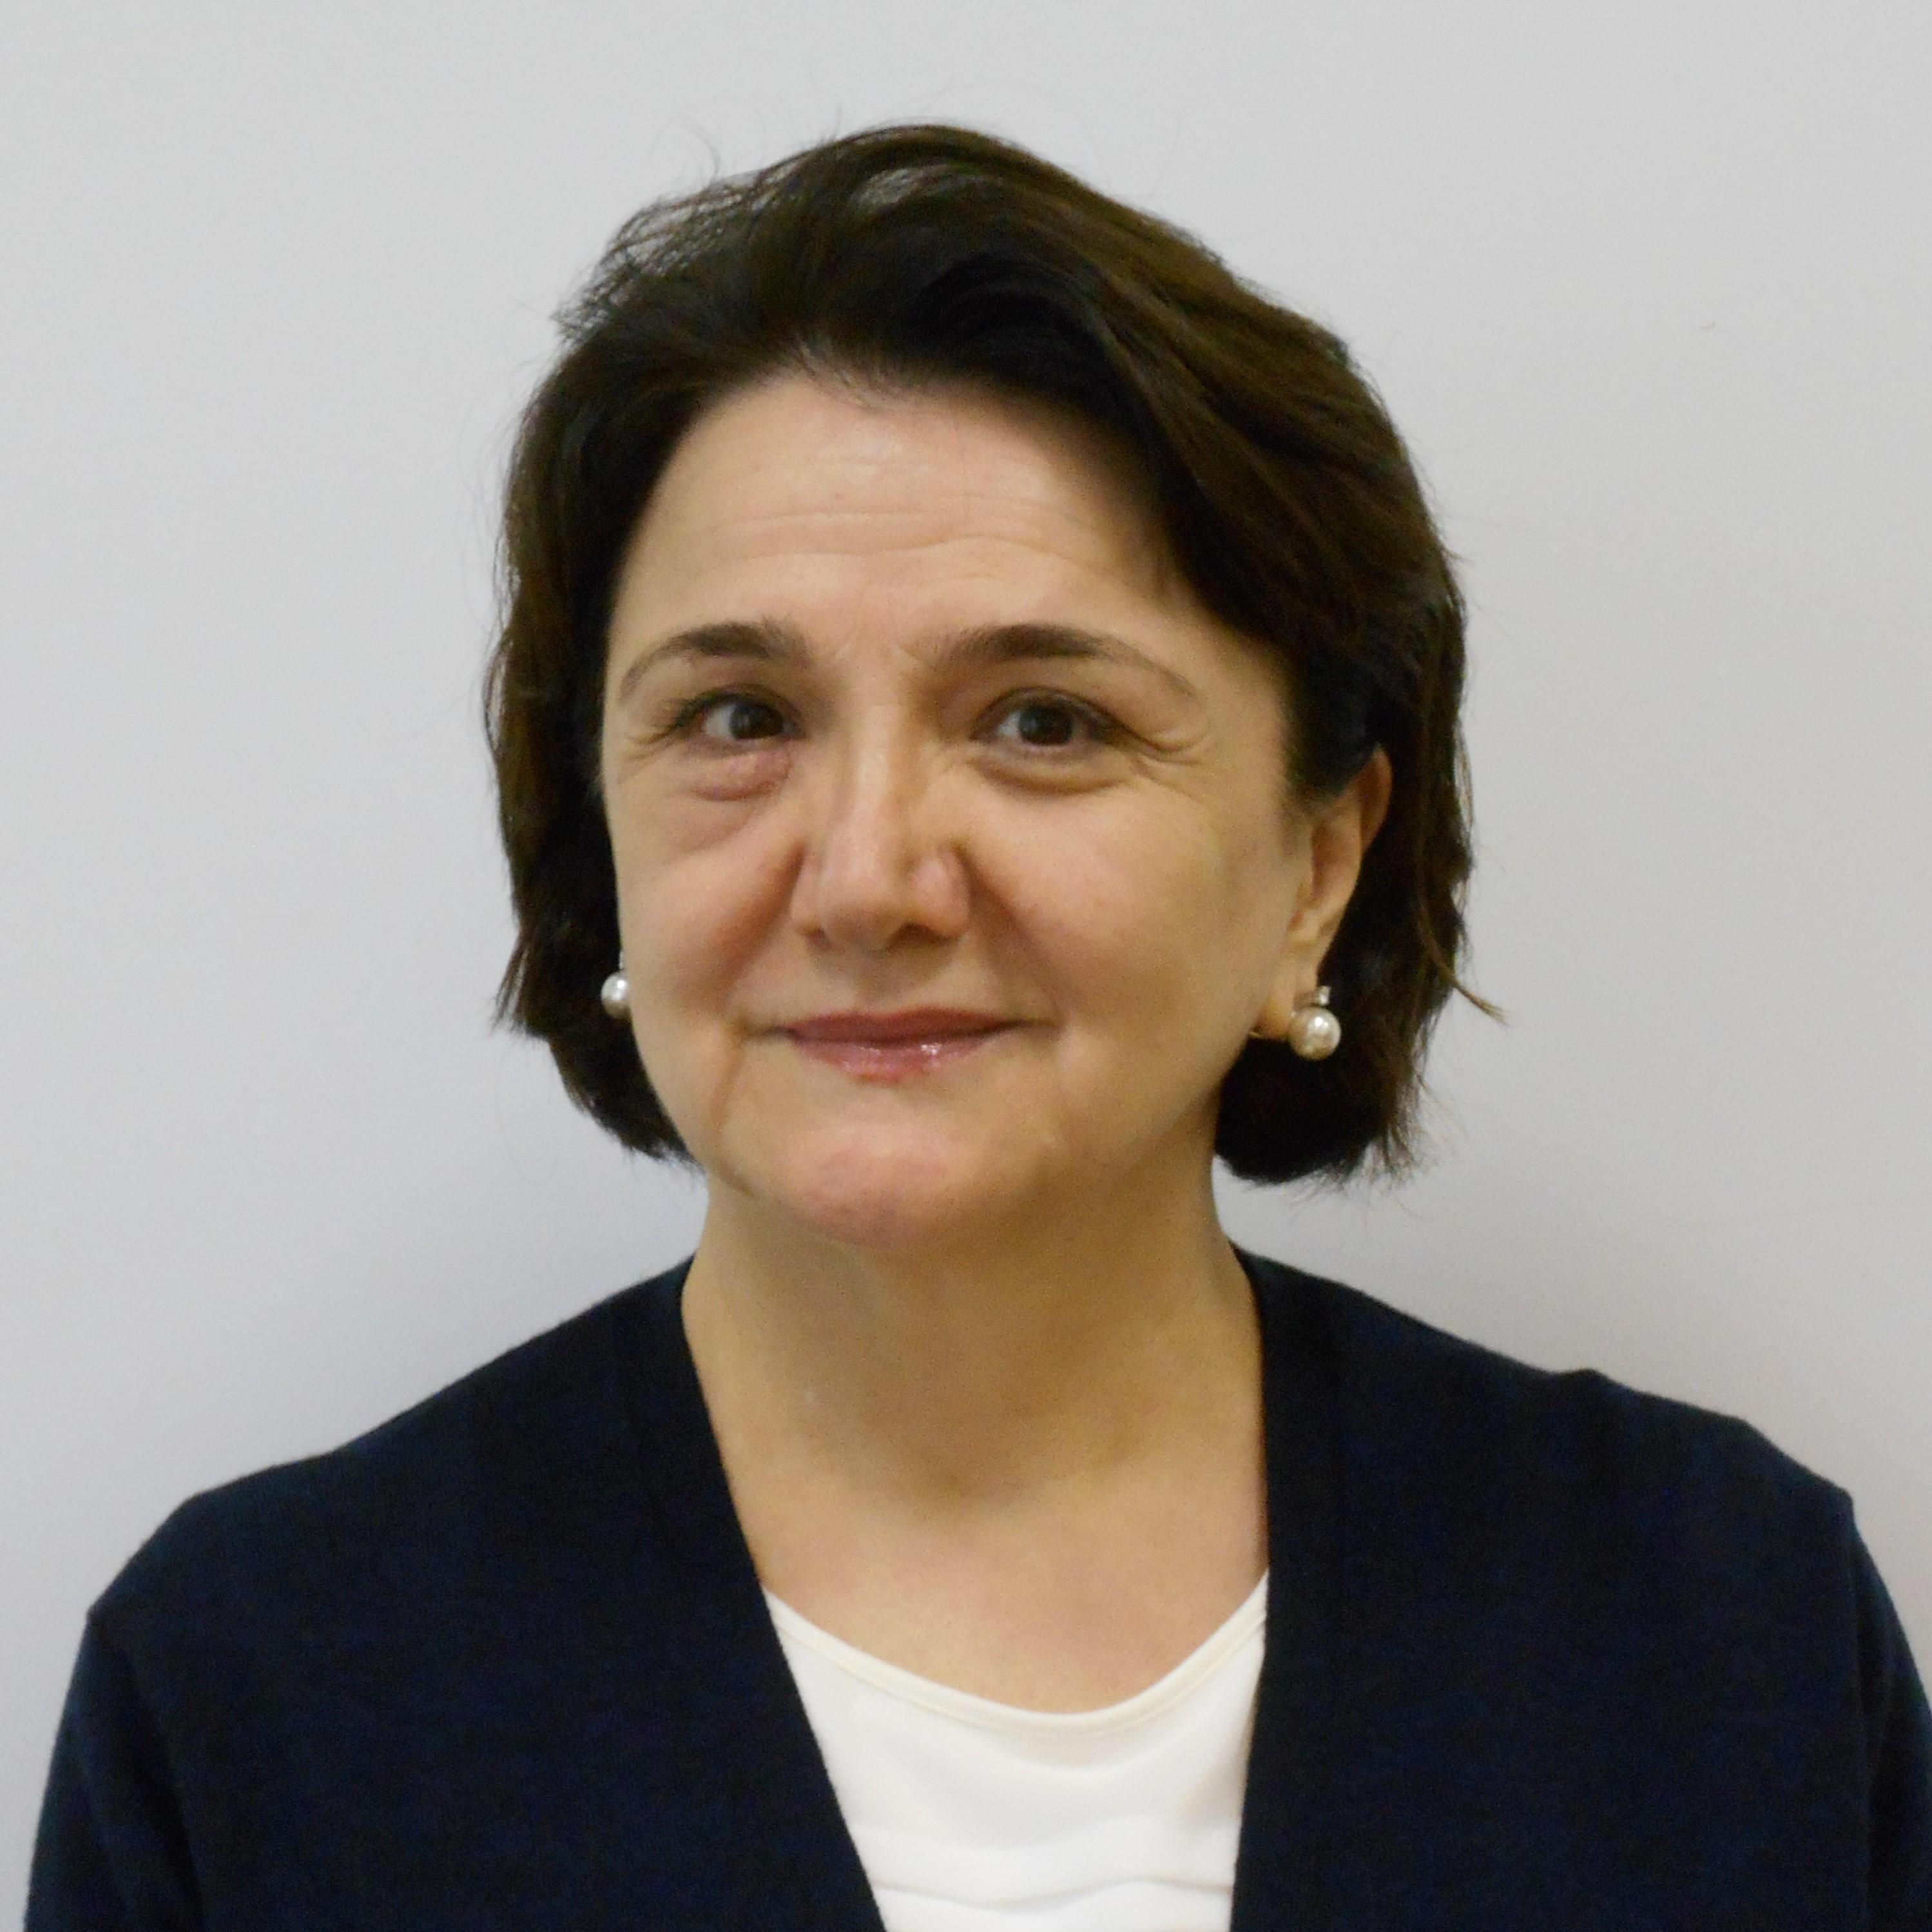 Шахманова Айшат Шихахмедовна